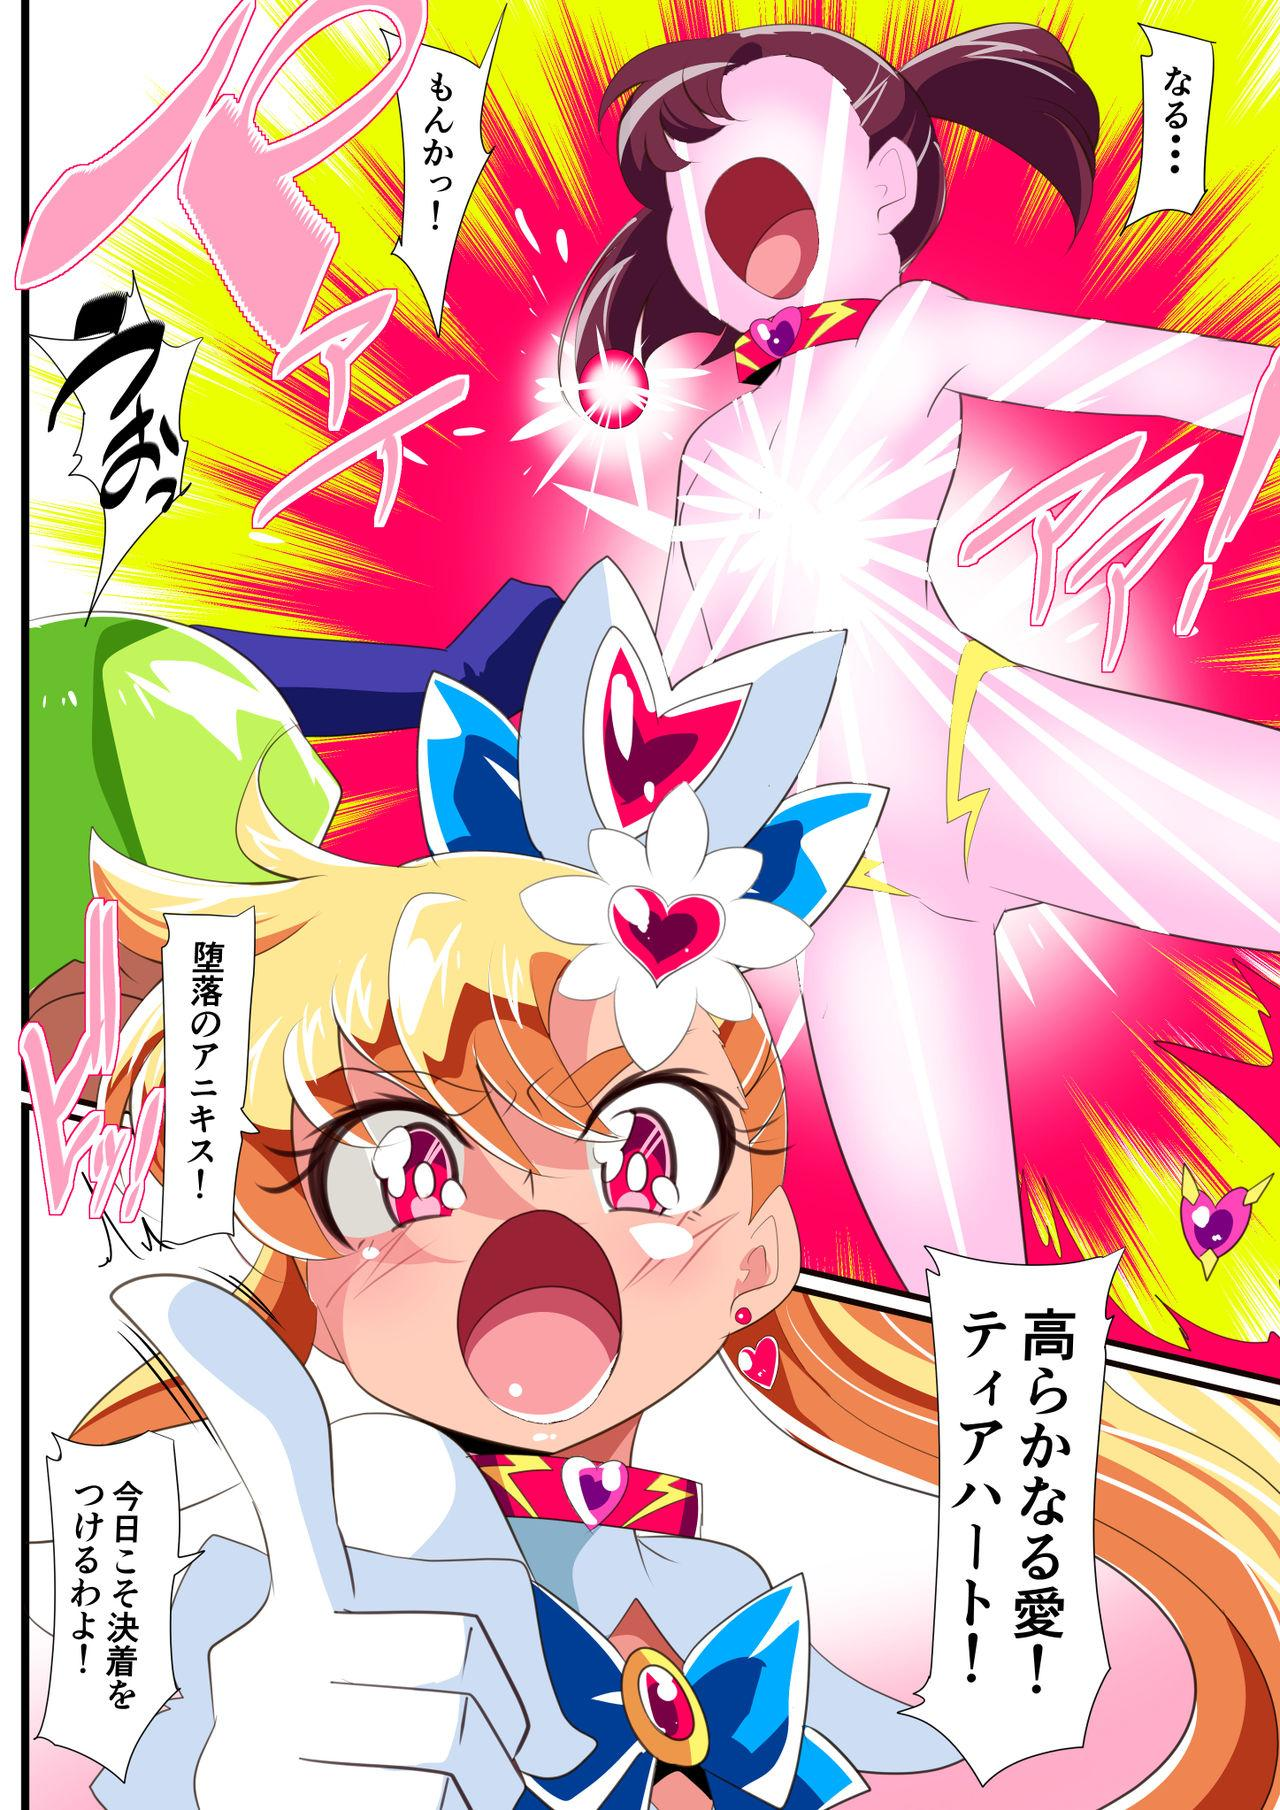 Ai no Senshi Love Tear 4 14